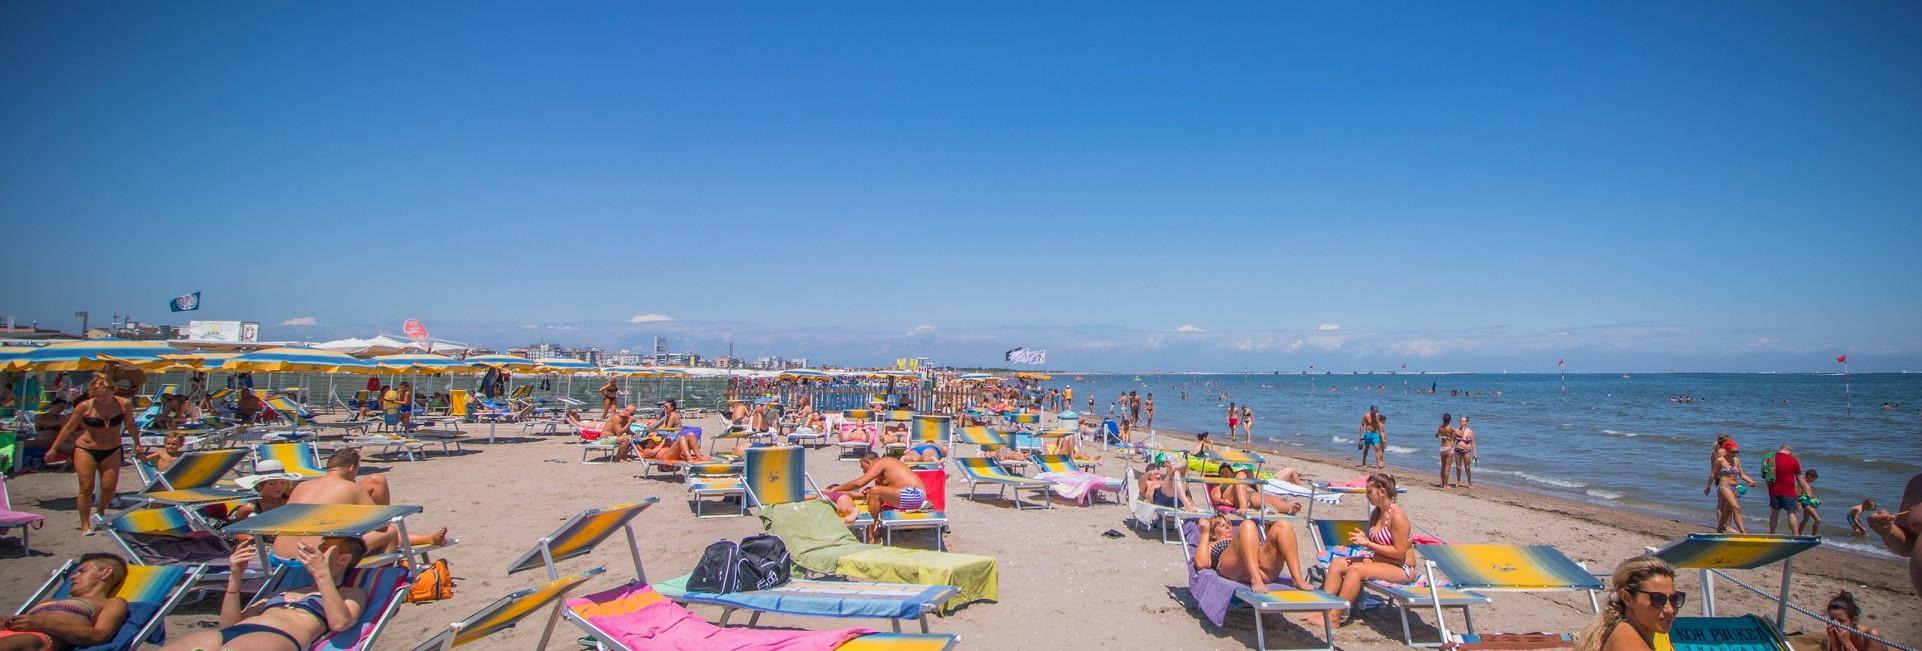 Marchi Beach